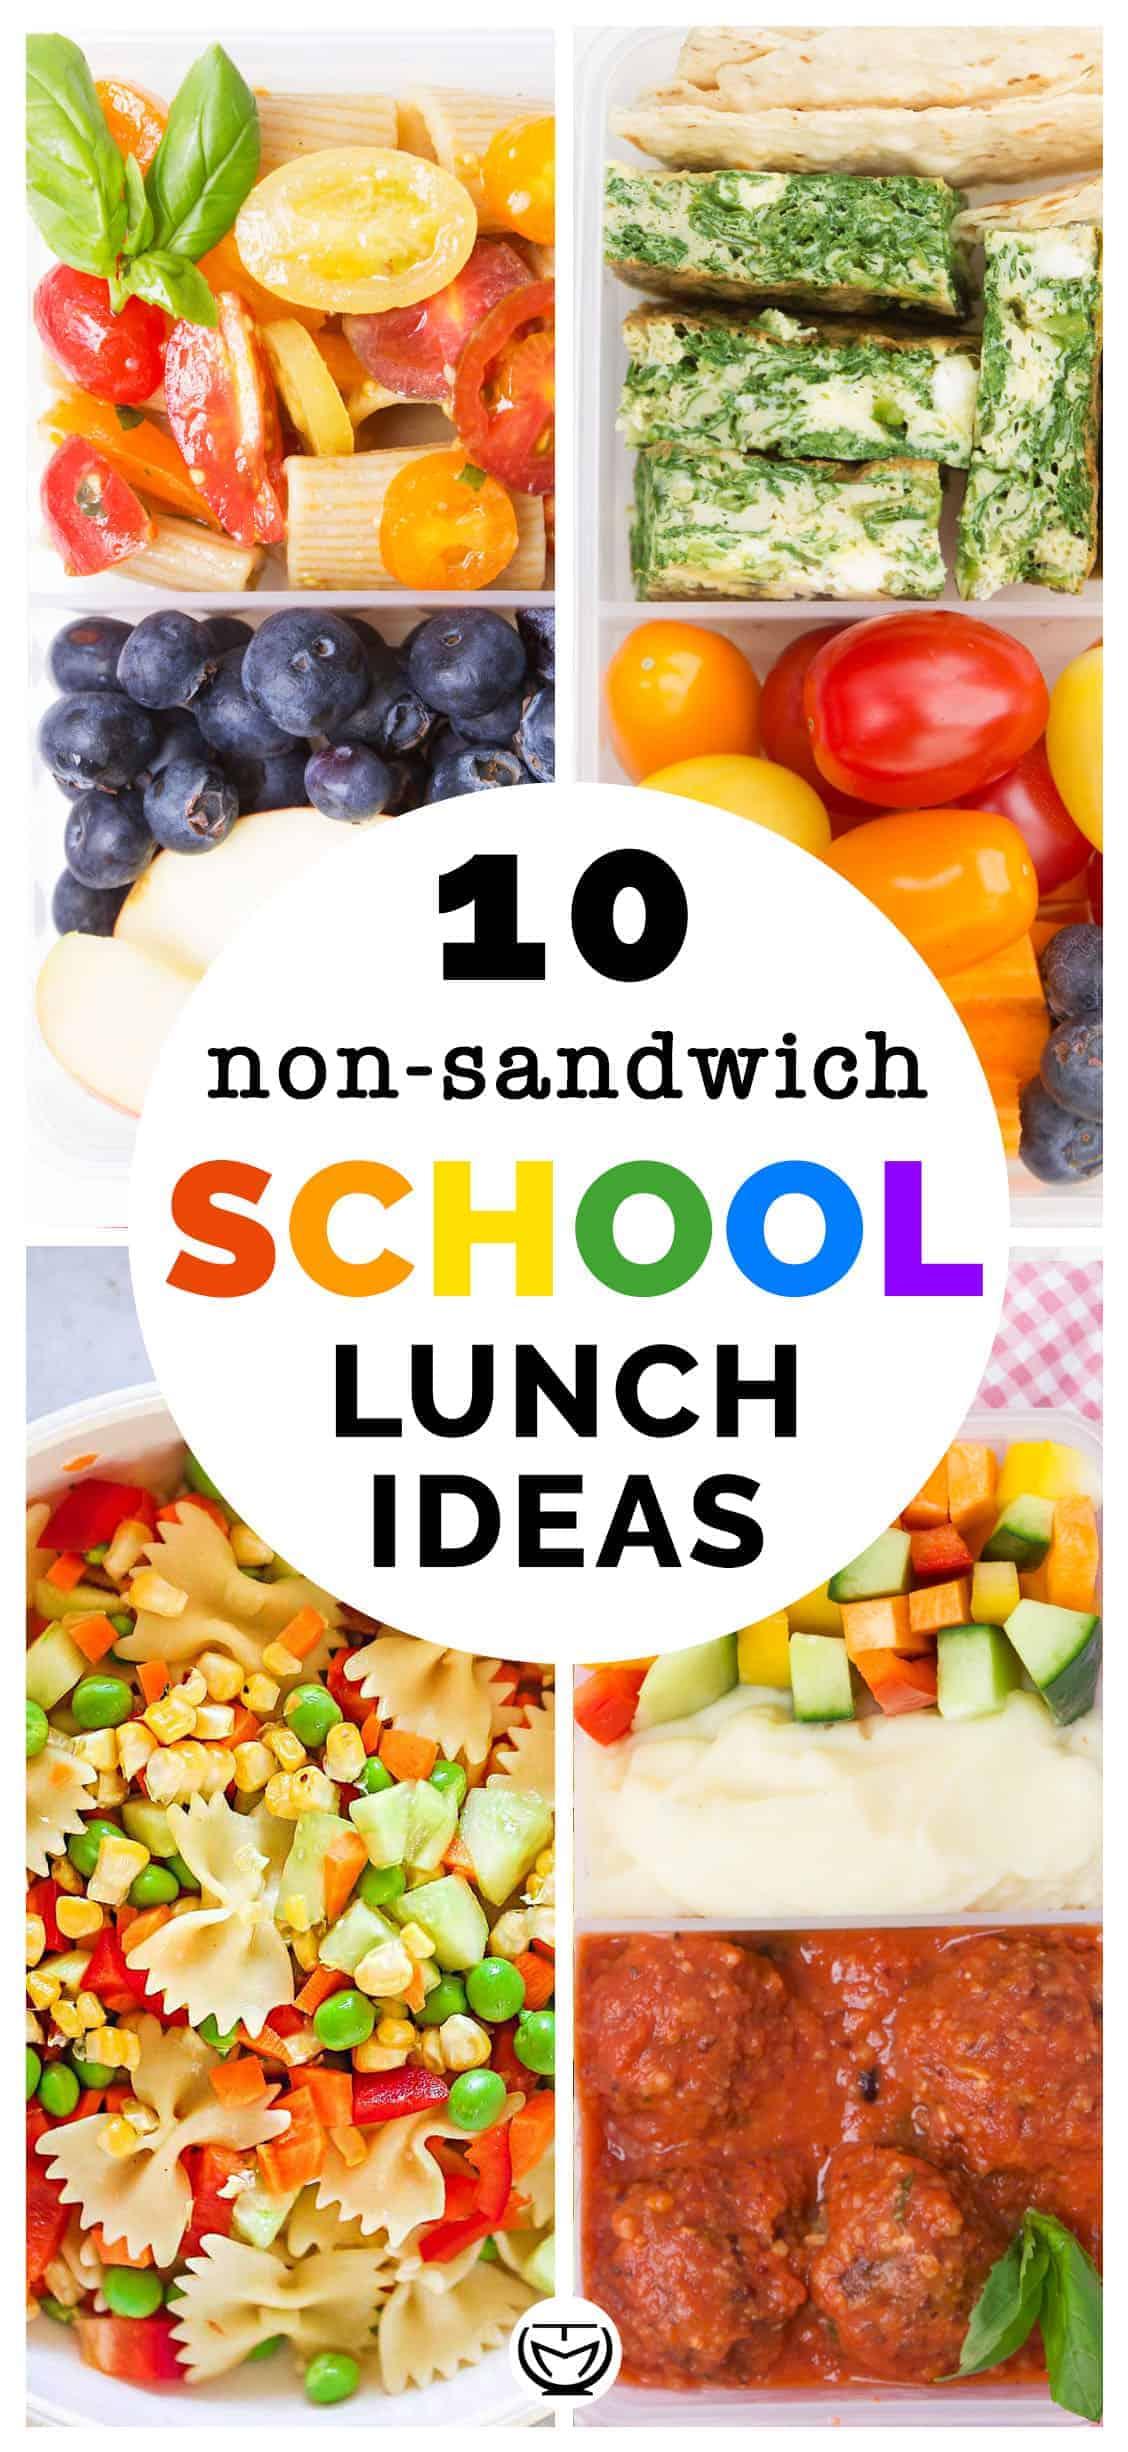 10 yummy and healthy lunch box ideas for school.